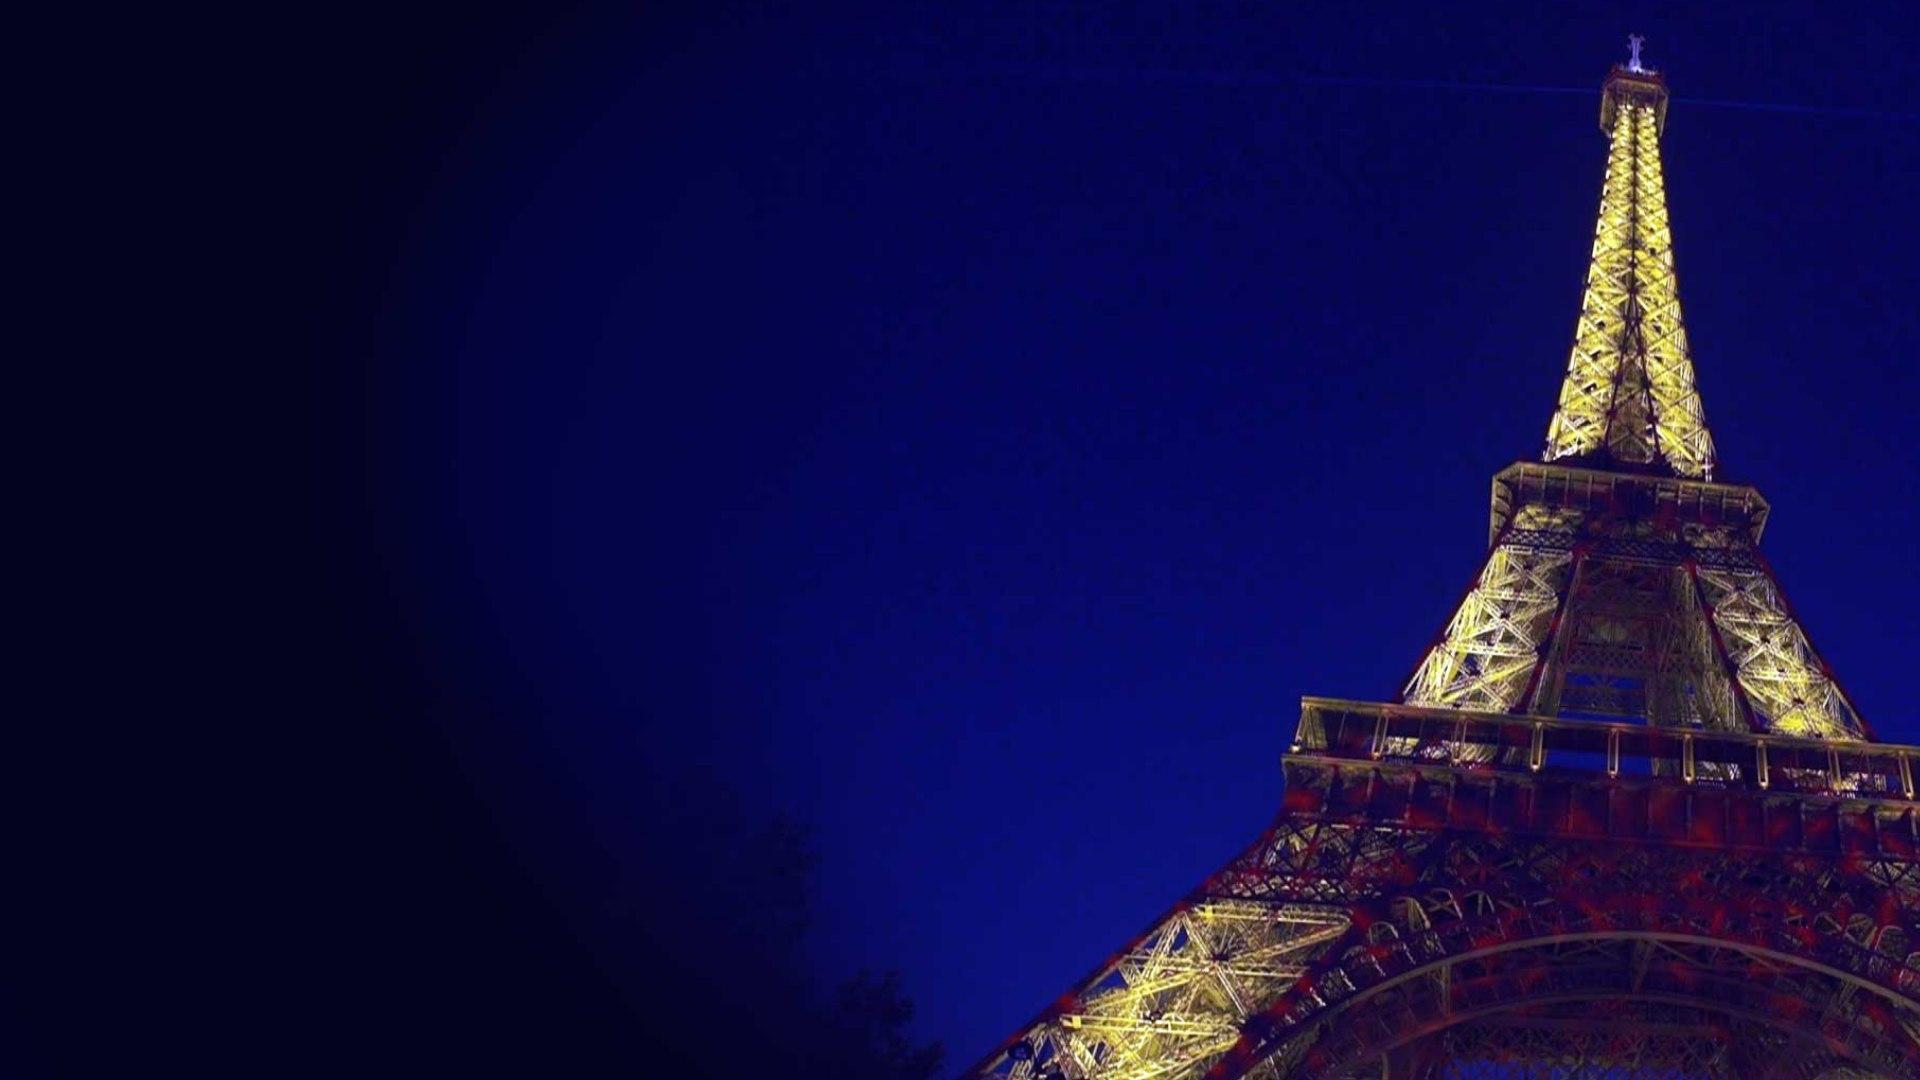 Sky Arte HD Torre Eiffel - La dama di ferro